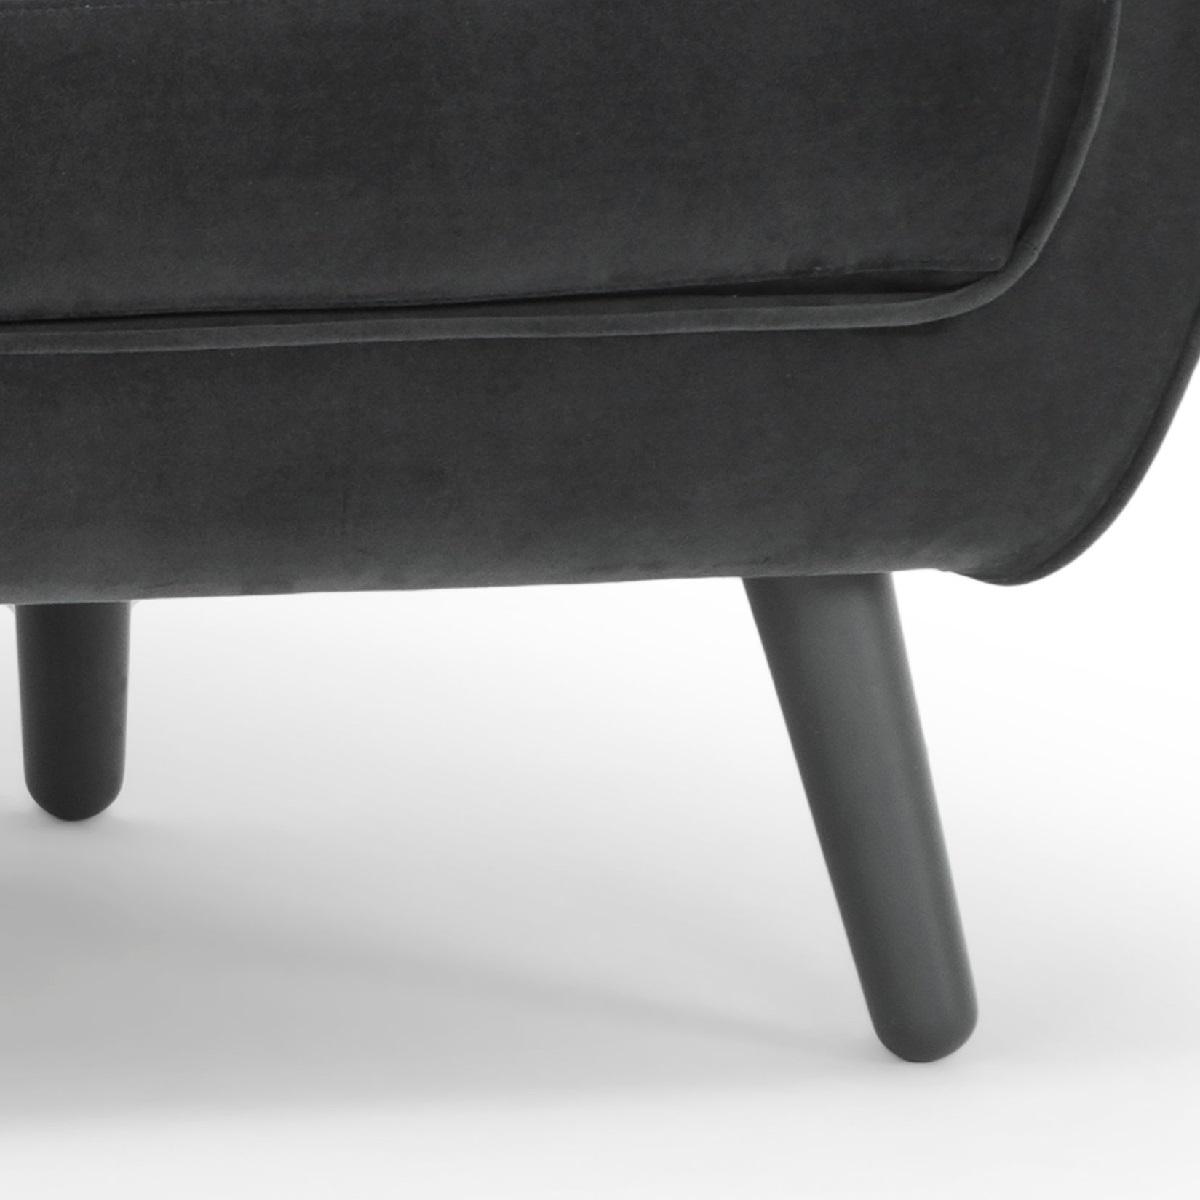 Marshall 2 Seater Sofa